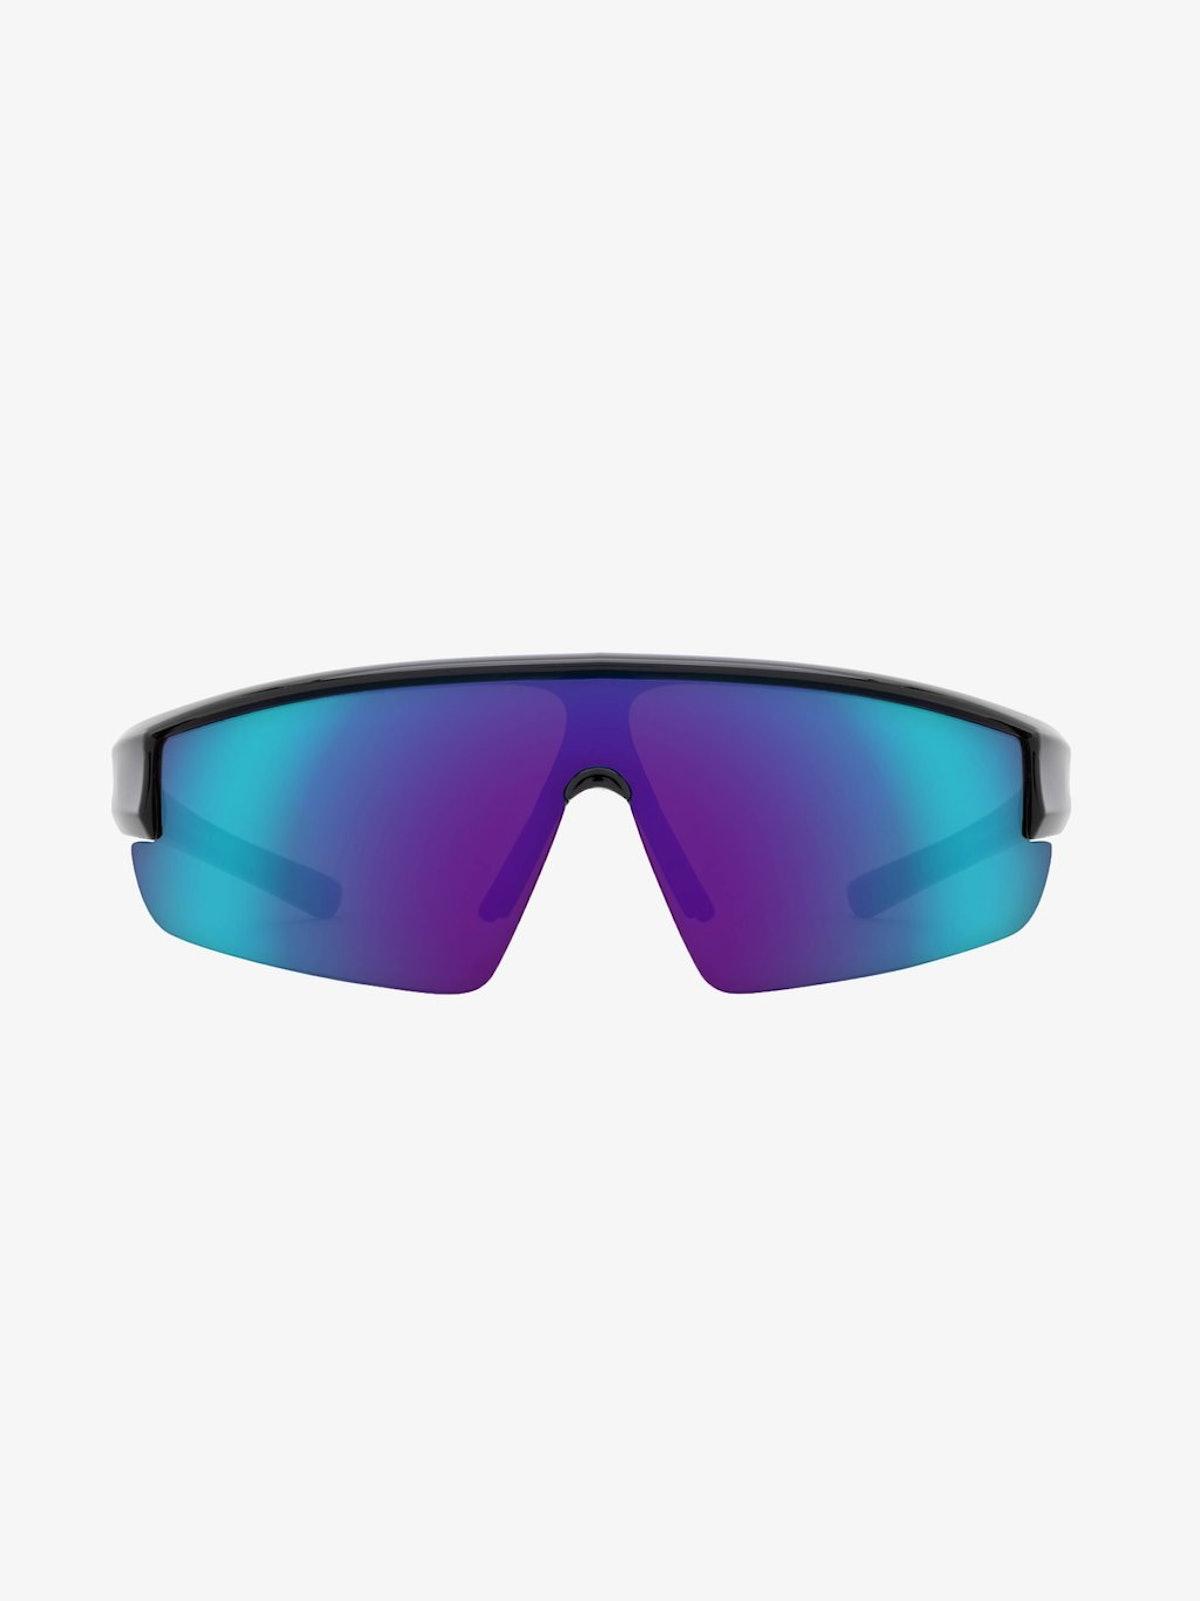 Sahara Purple Shield Sunglasses